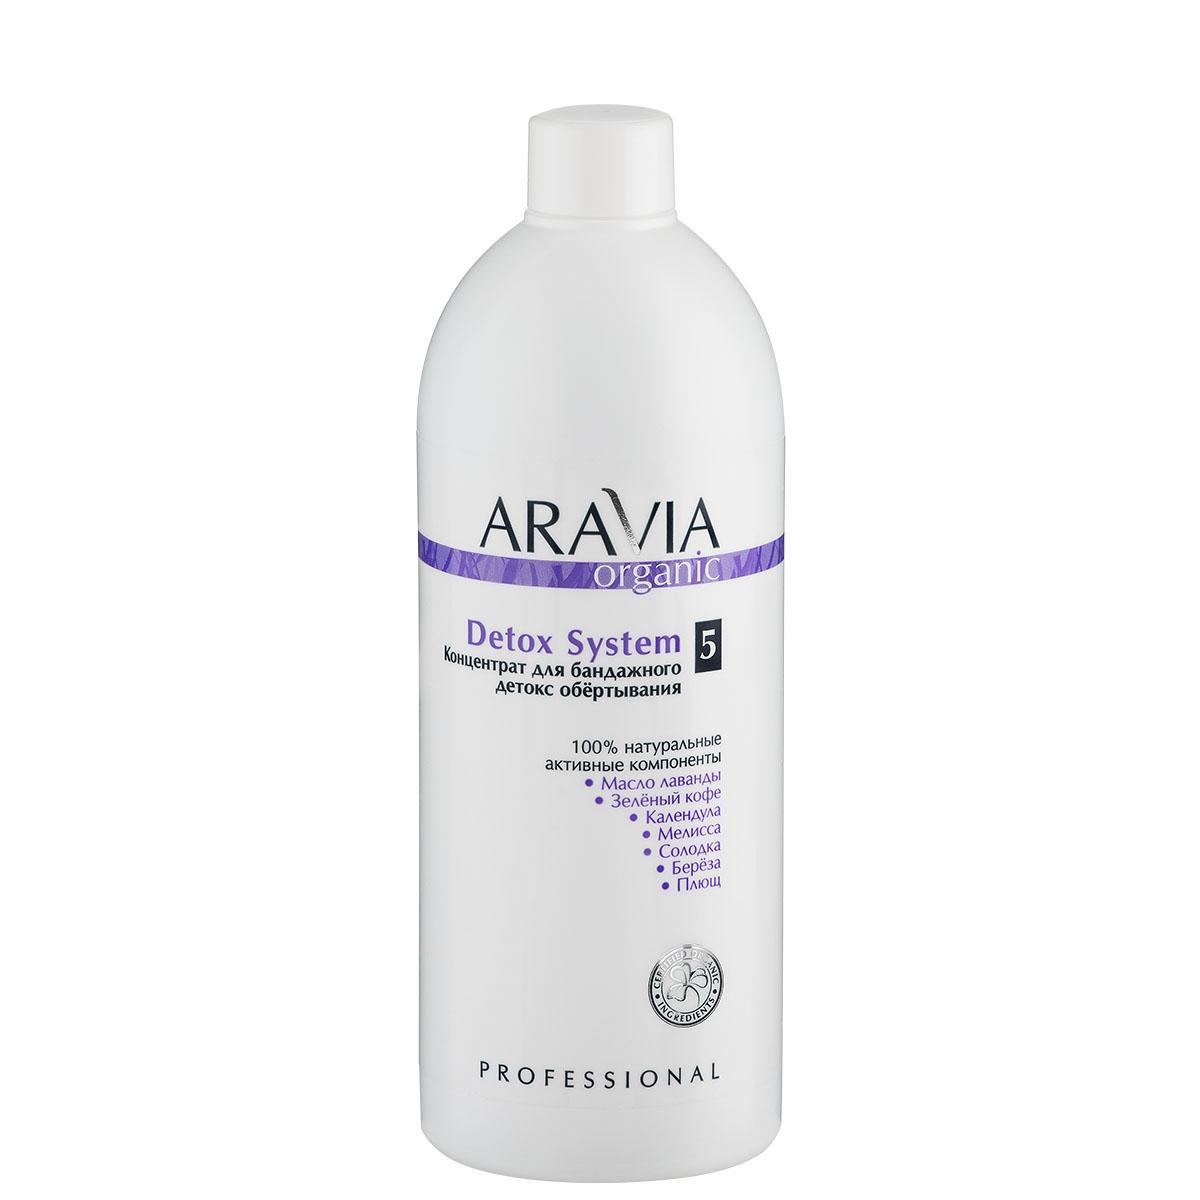 ARAVIA Концентрат для бандажного детокс обертывания Detox System, 500 мл